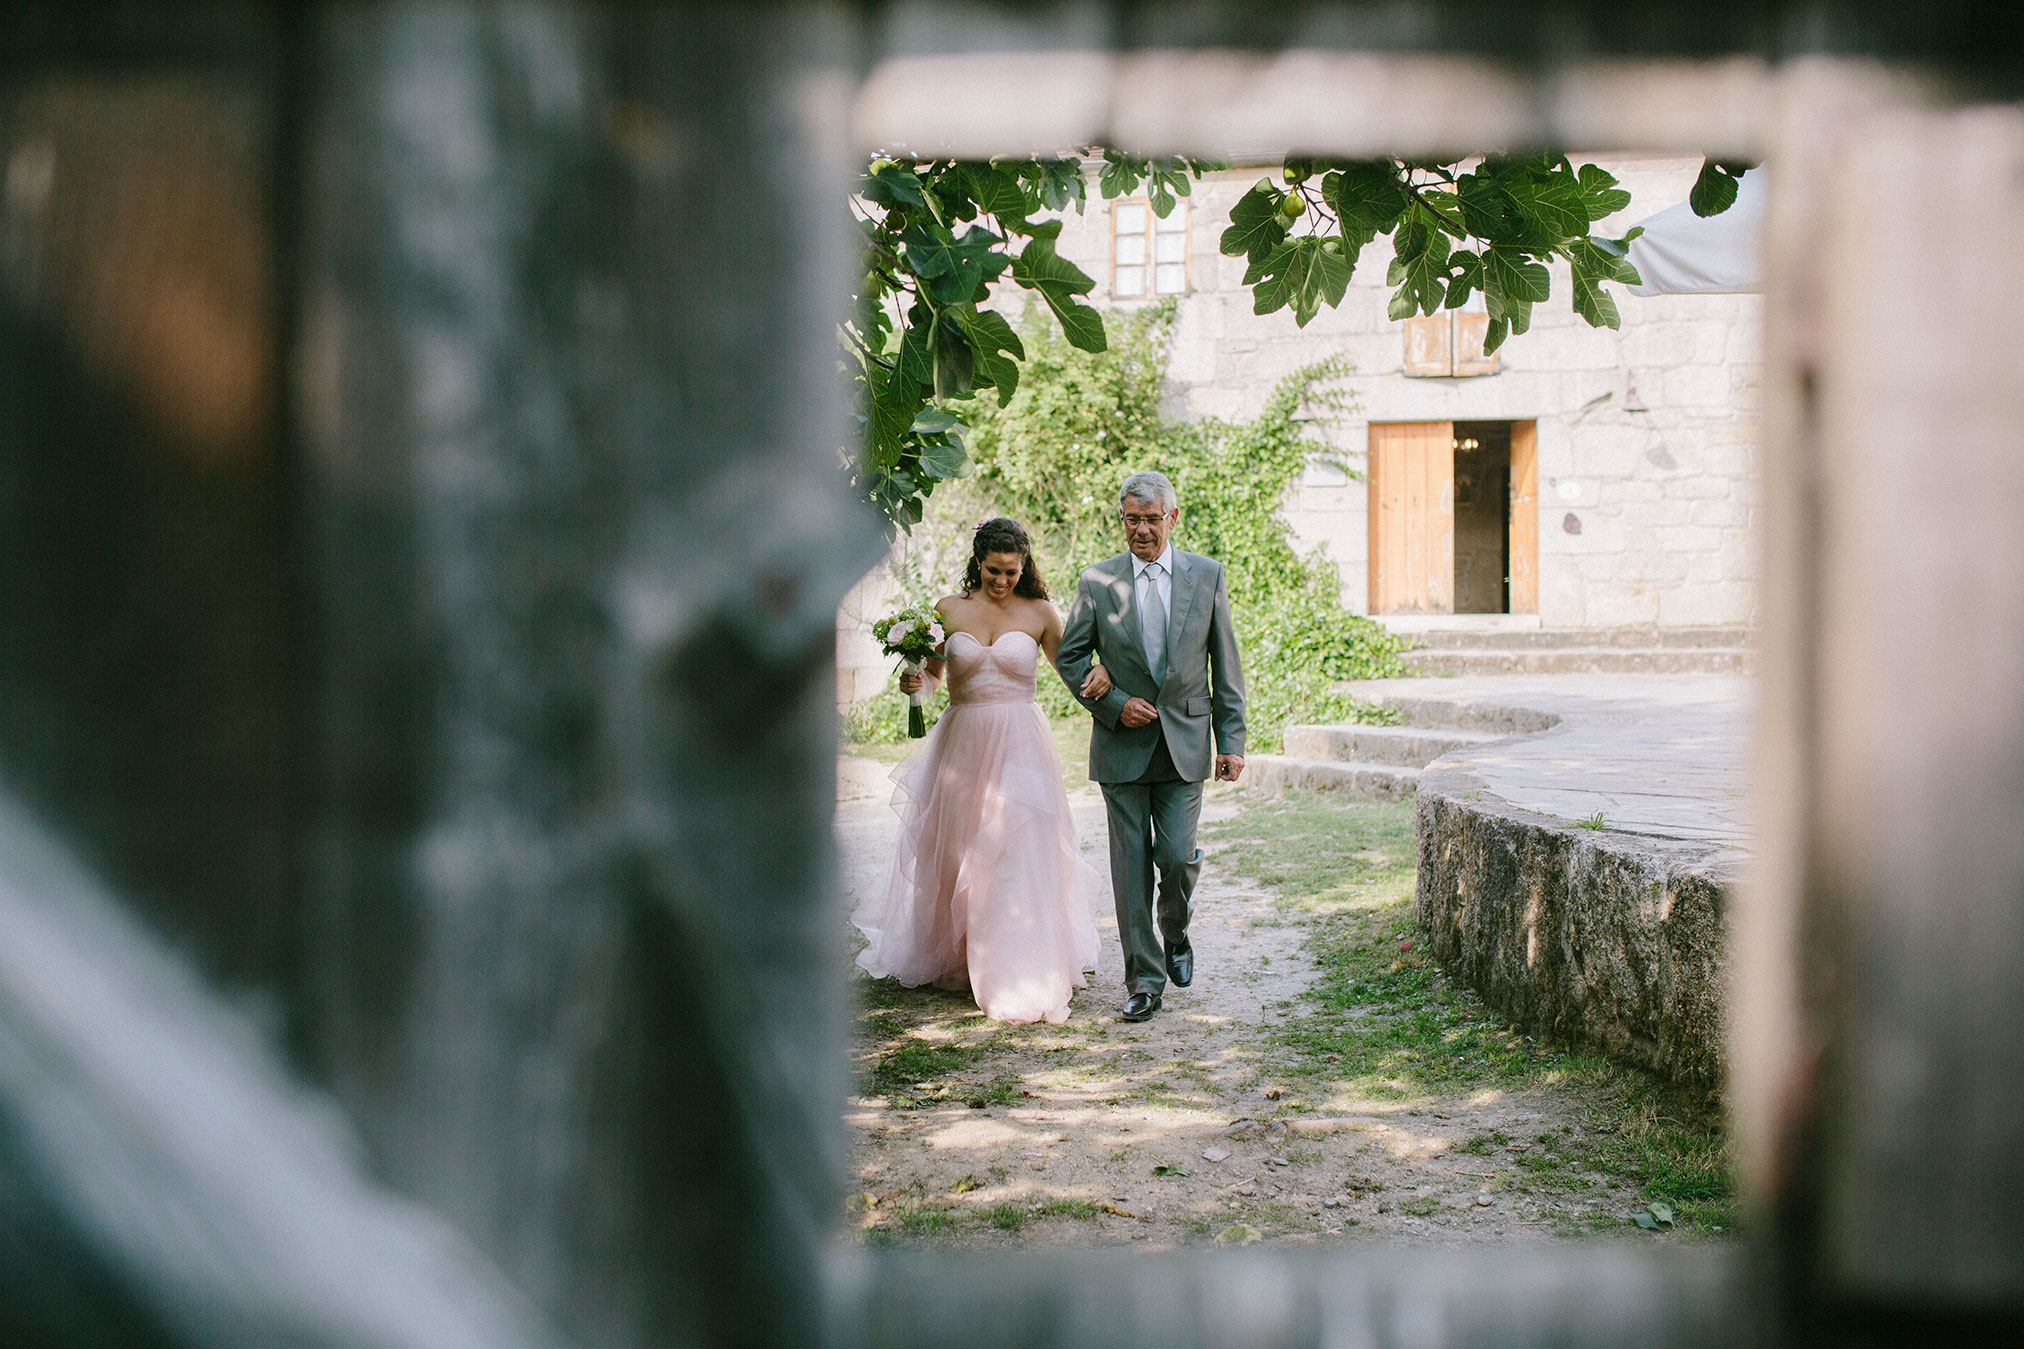 Wedding Photographer Graciela Vilagudin Dublin Galicia 797.jpg